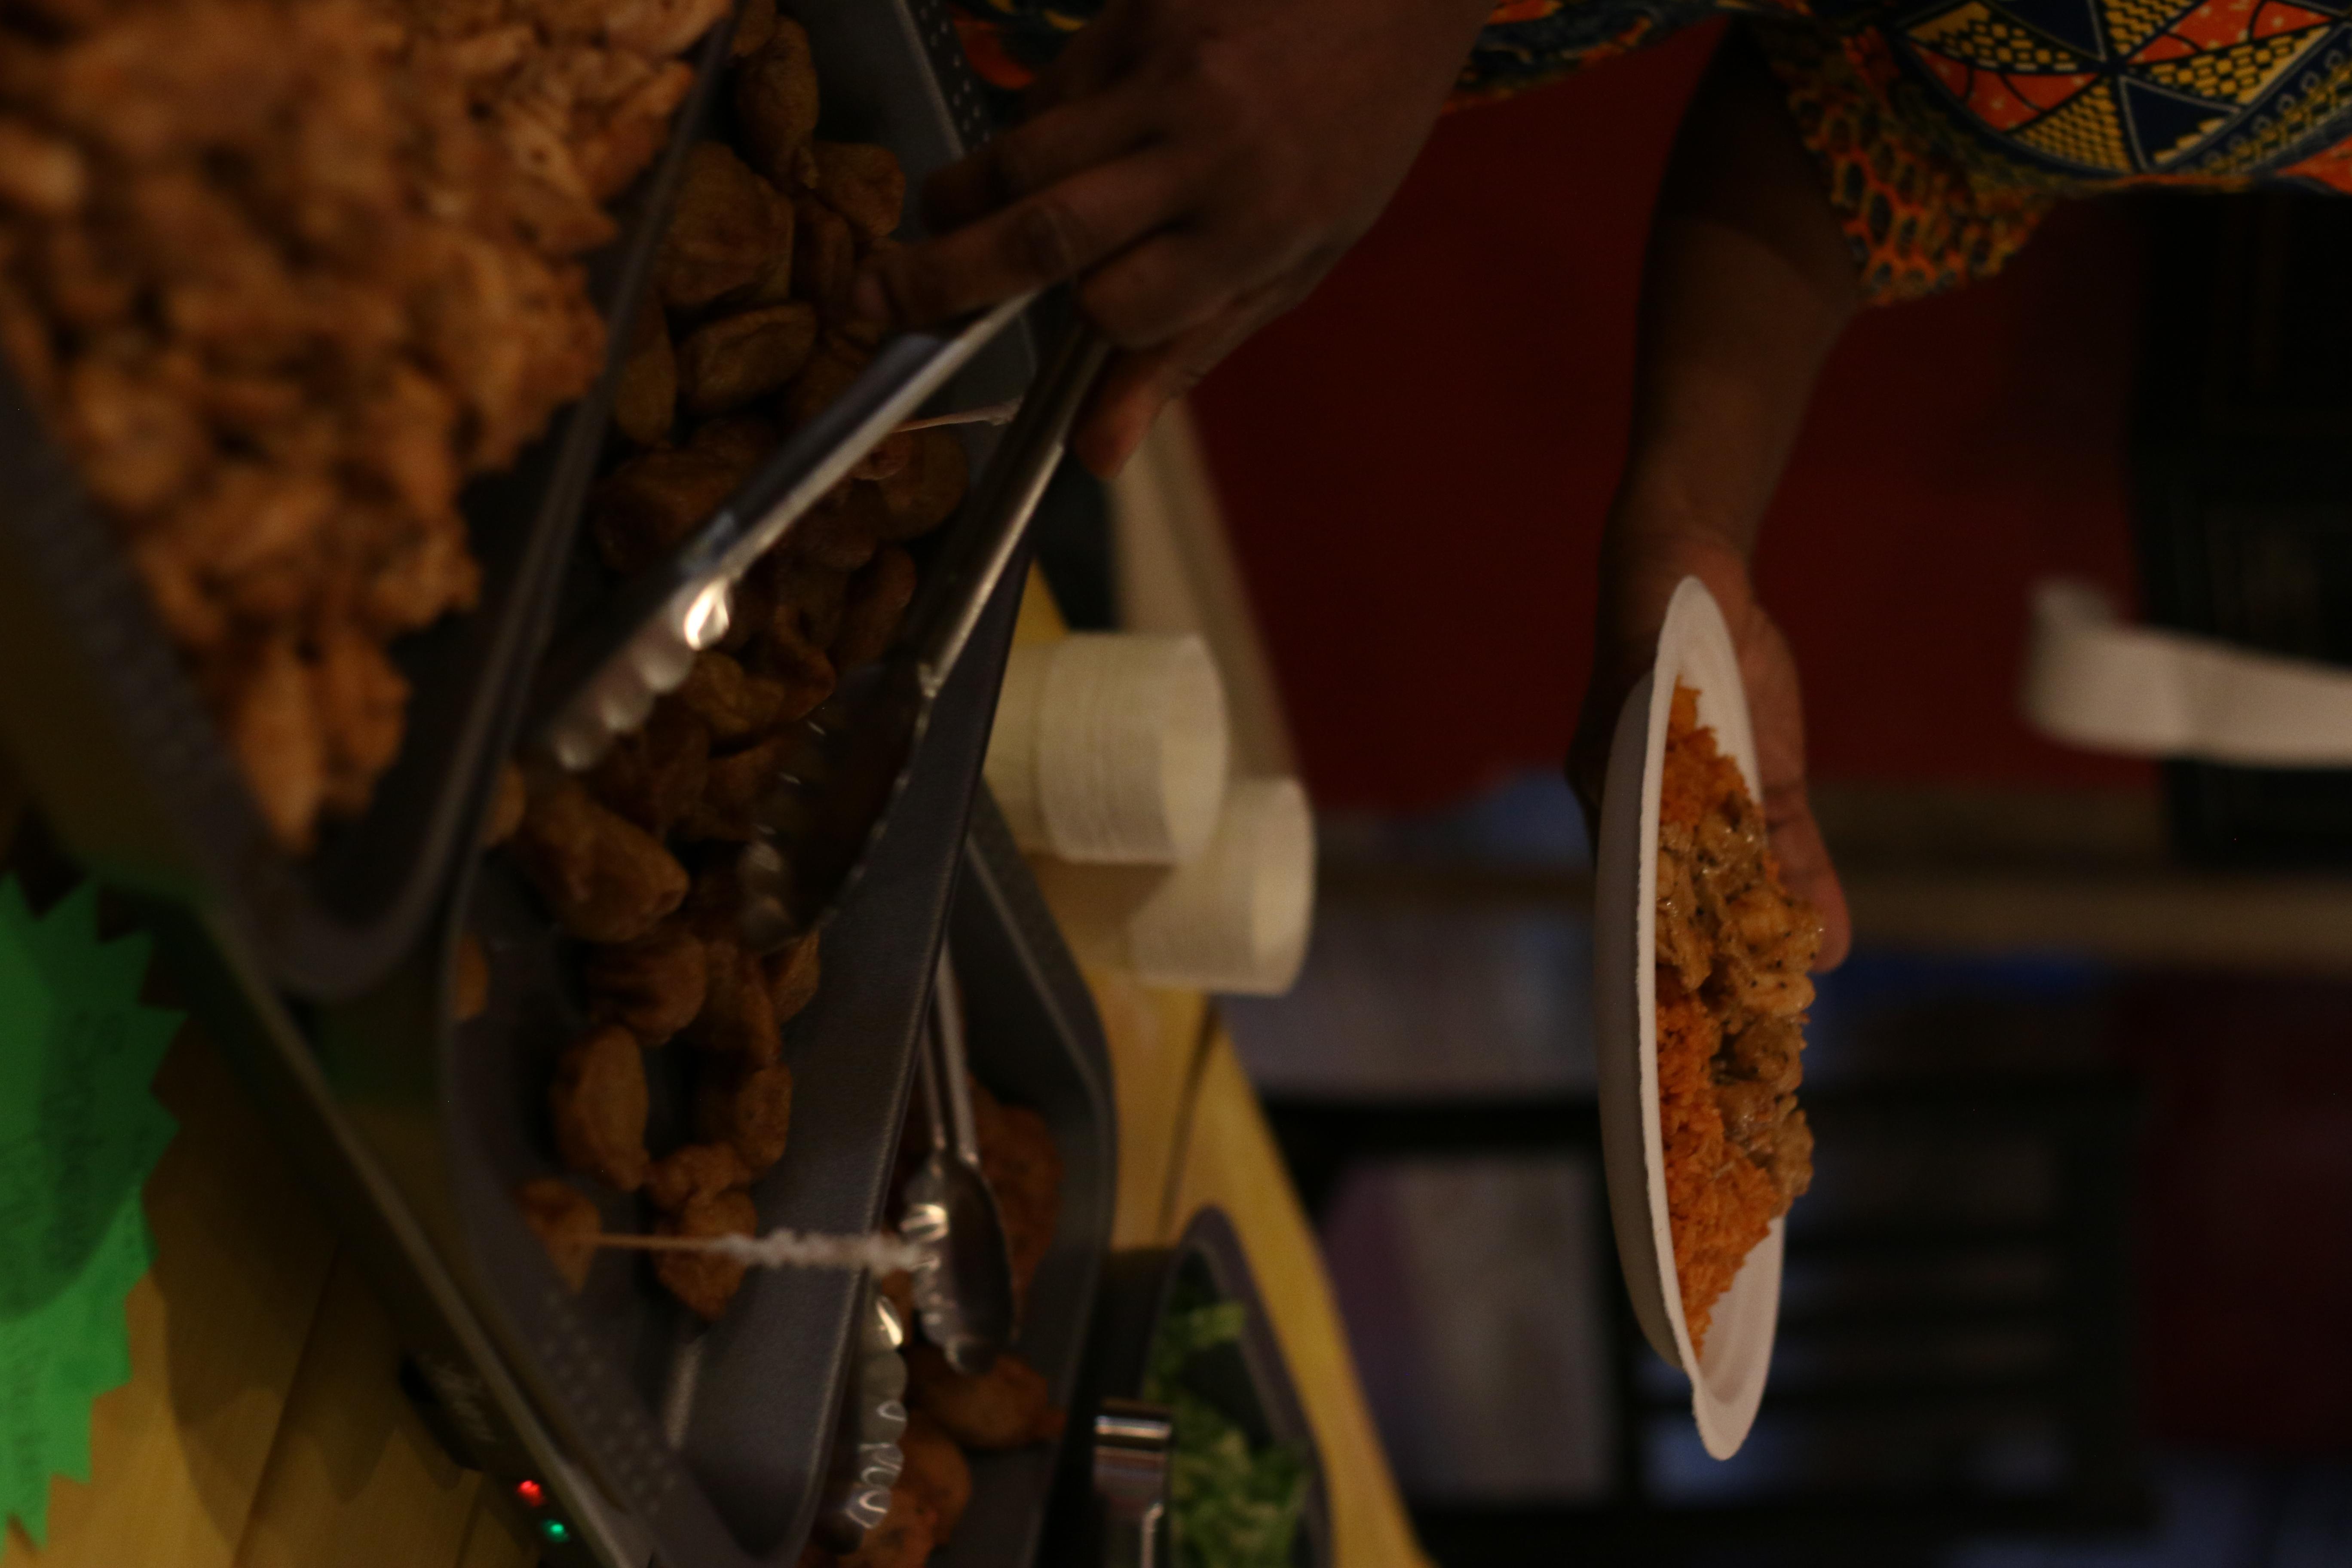 Serving plantain balls